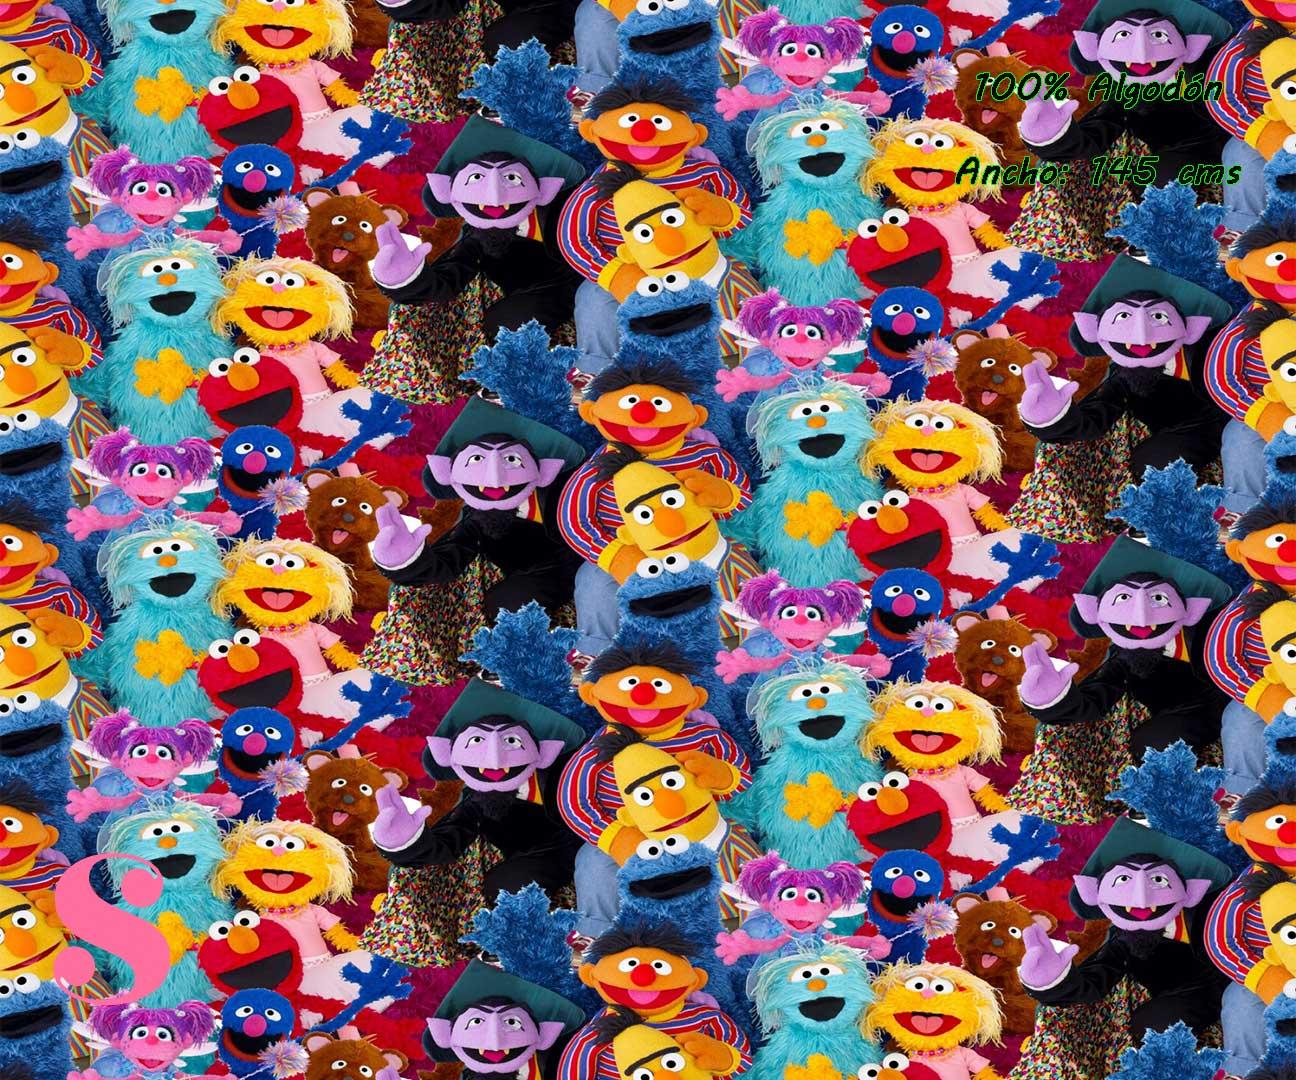 12-telas-infantiles,estampados-infantiles,telas-disney,telas-con-licencia,telas-estampadas-frikis,telas-por-metros,Tejido Estampado Barrio Sésamo